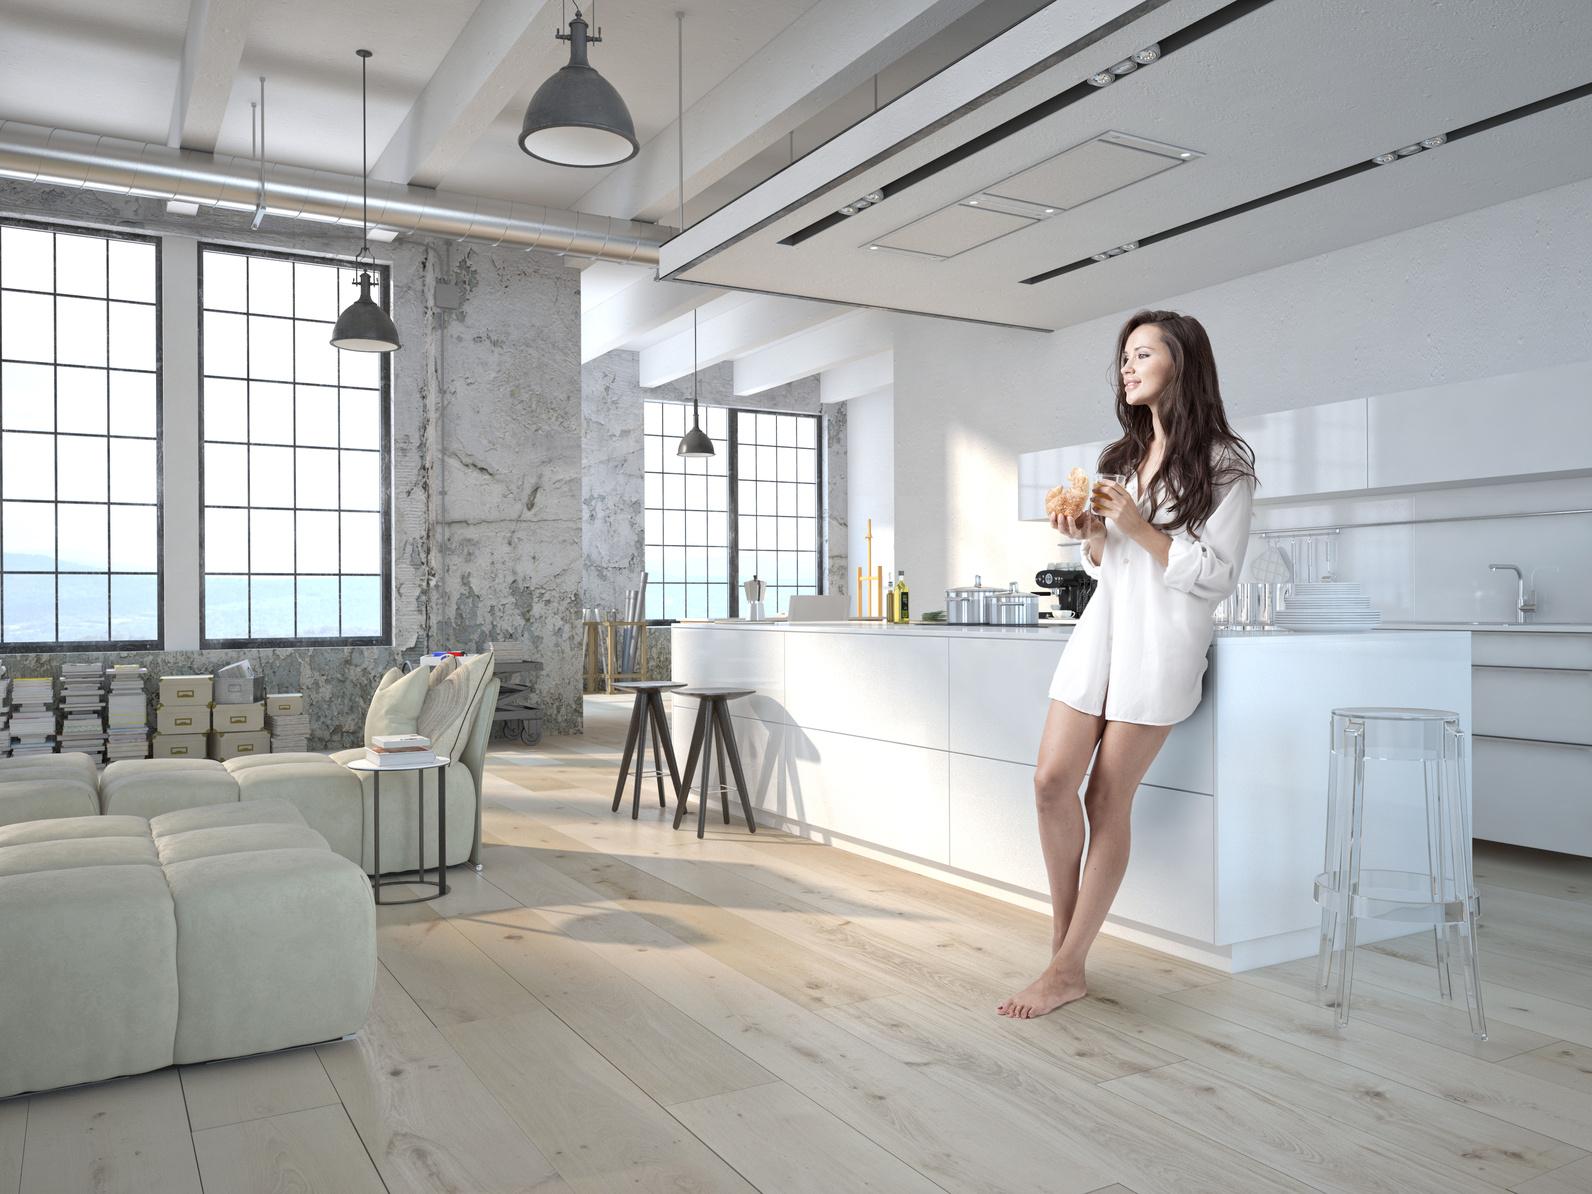 The Whittier, CA area's best luxury vinyl flooring store is Triple A Flooring Inc